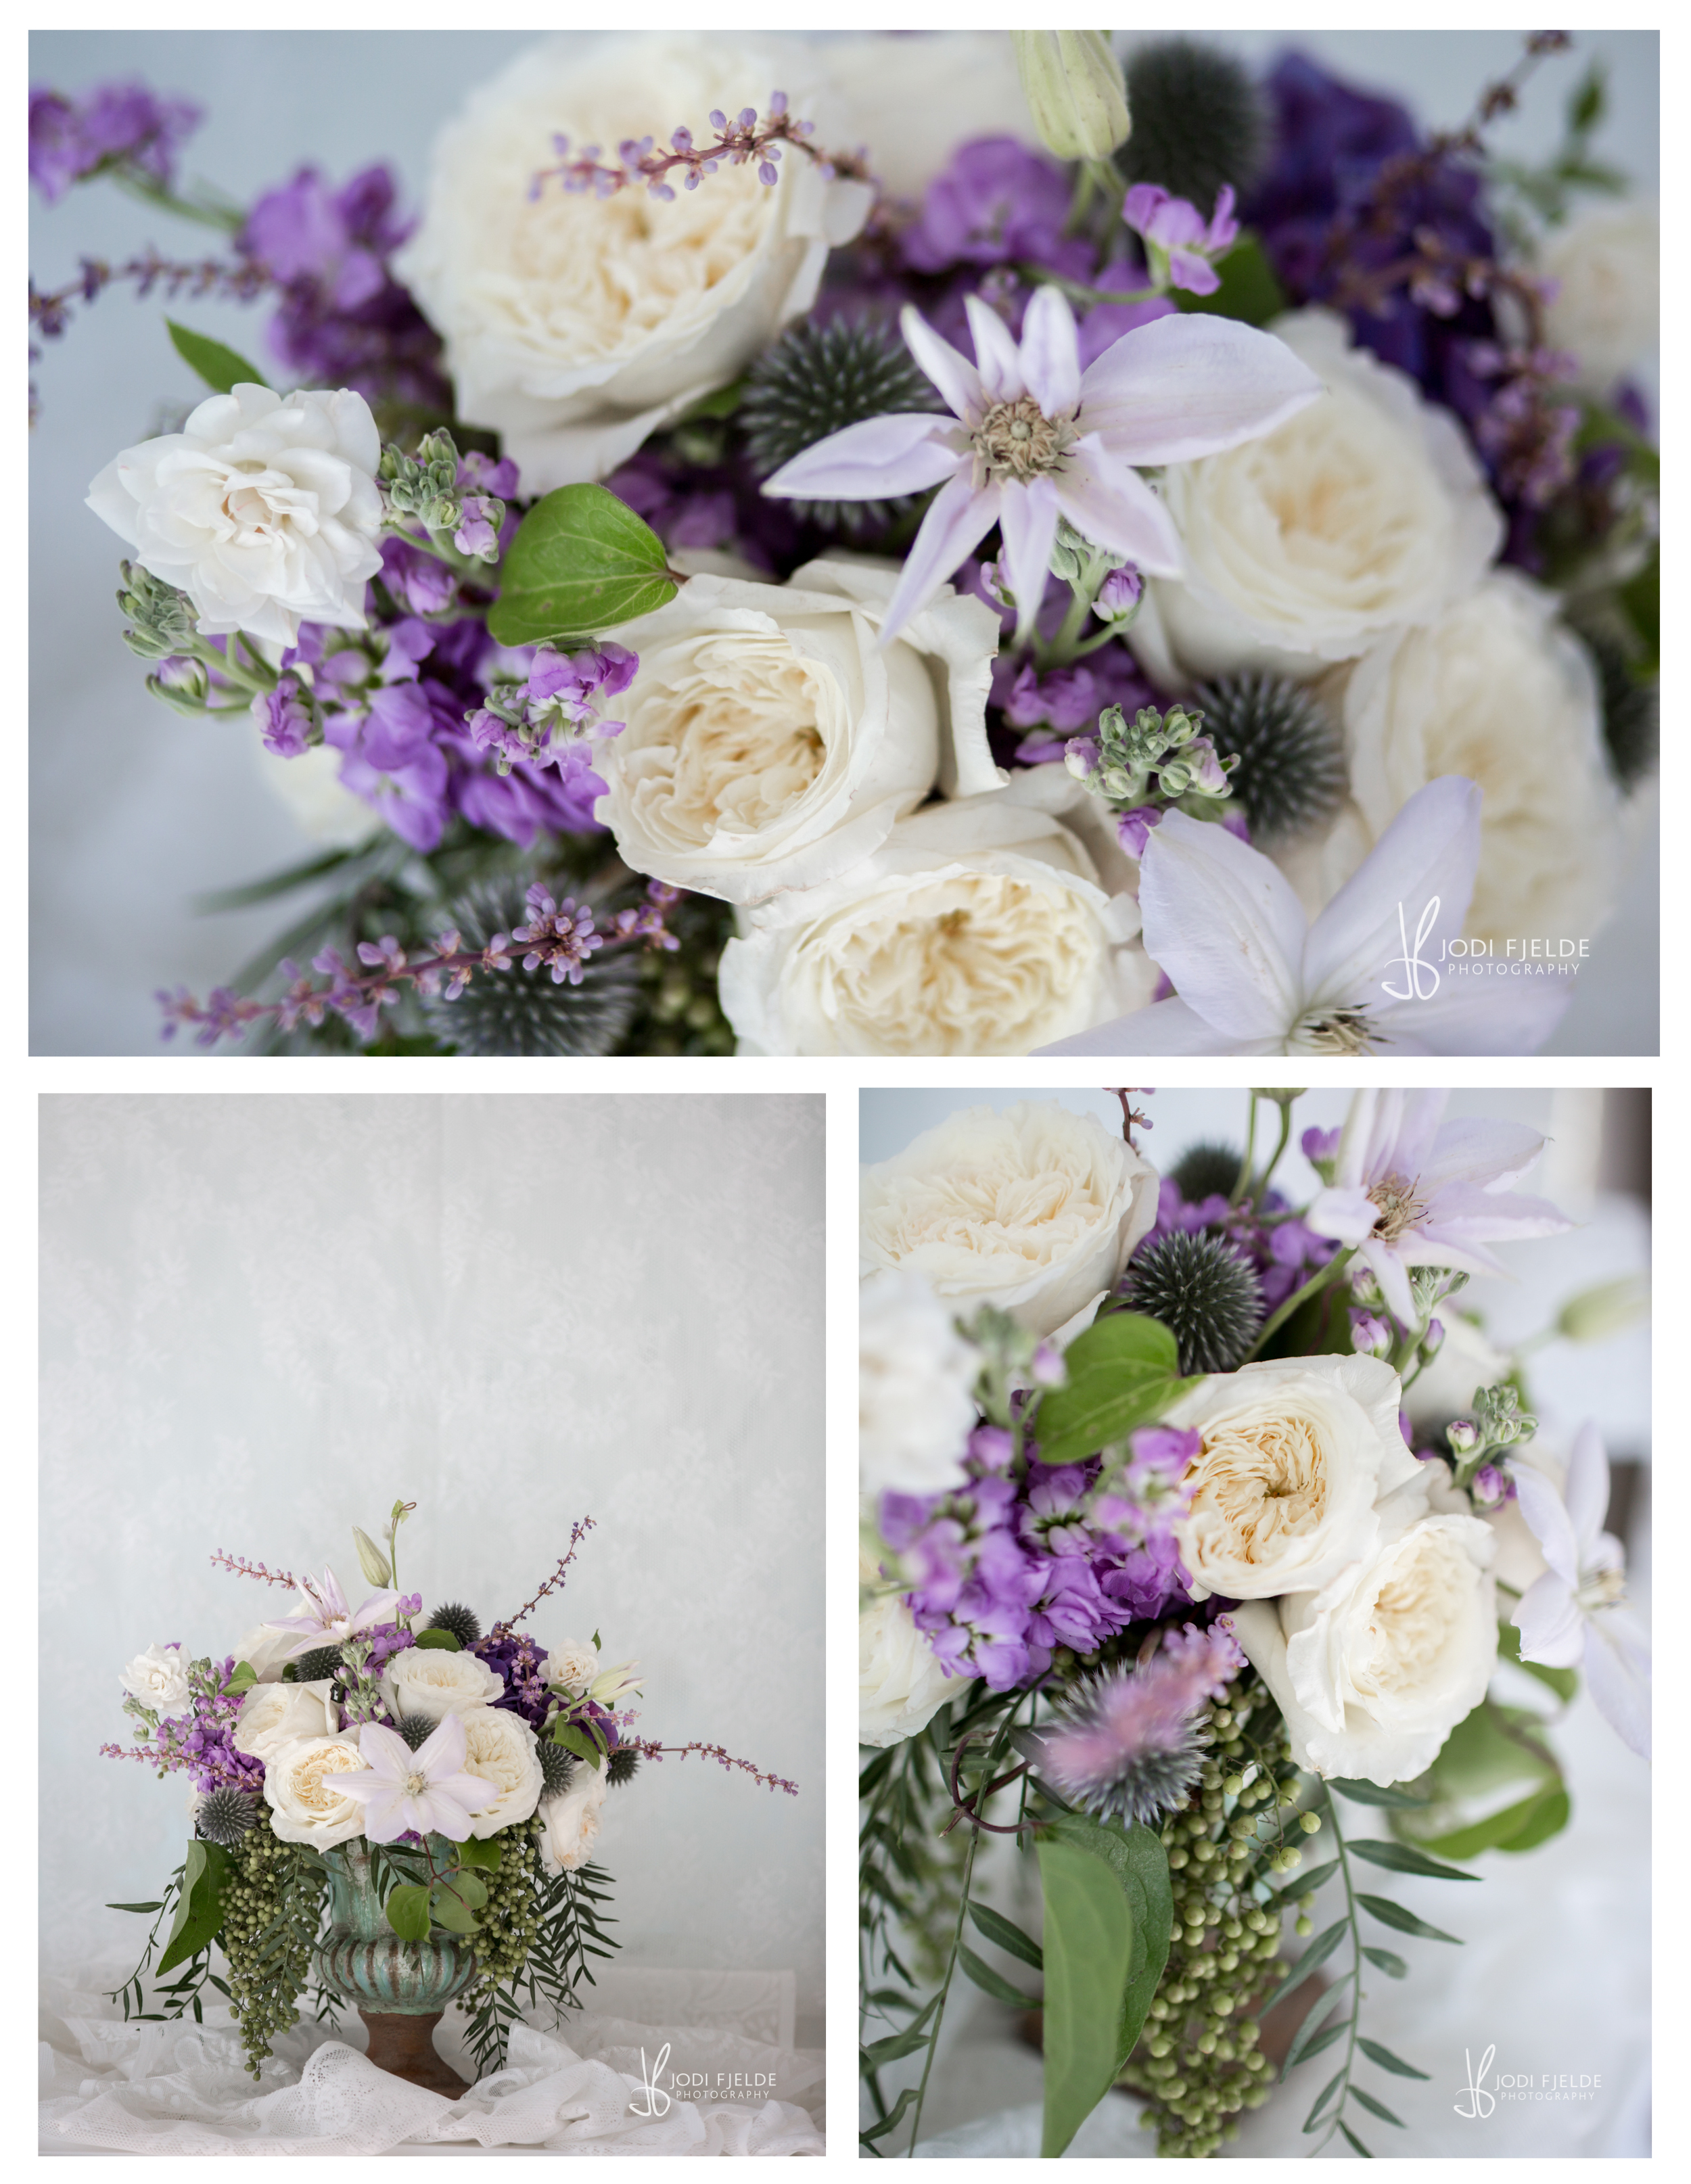 Parkland_Commercial_Business_Branding_Photography_Flowerly Studio_Jodi_Fjelde_Photogrpahy_8.jpg